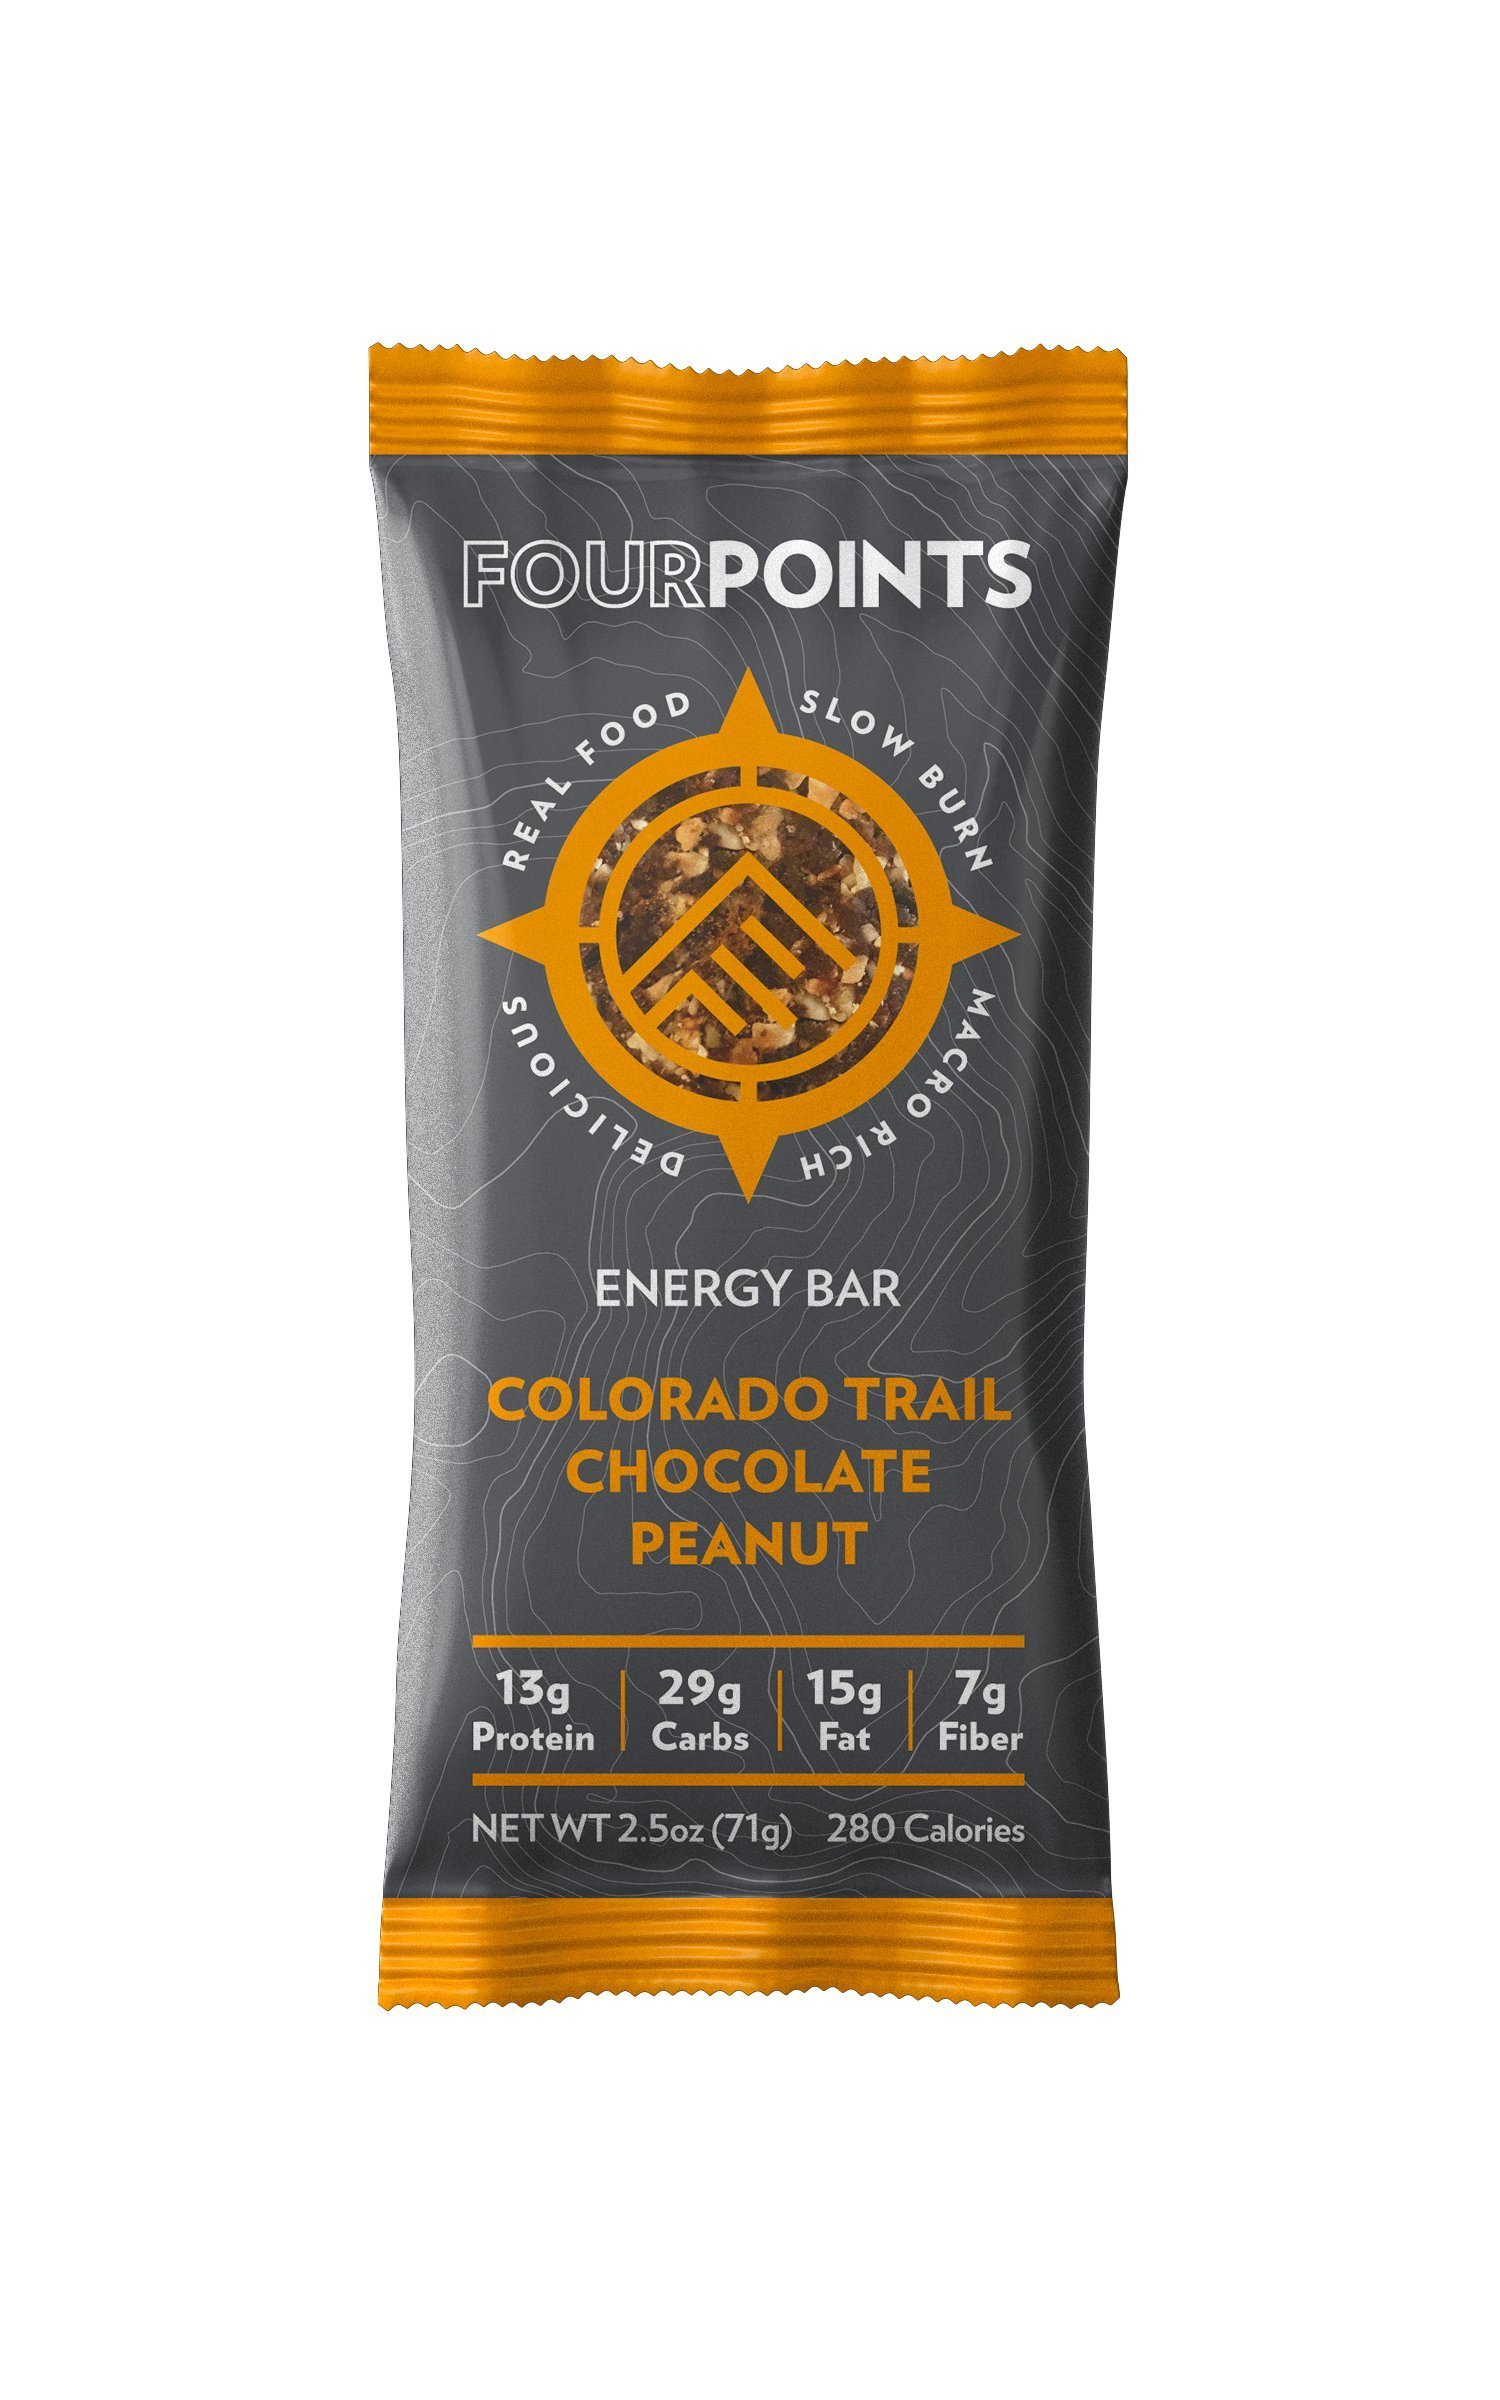 Fourpoints Colorado Trail Chocolate Peanut Bar - Box of 12 - Colorado Trail Chocolate Peanut, Box of 12